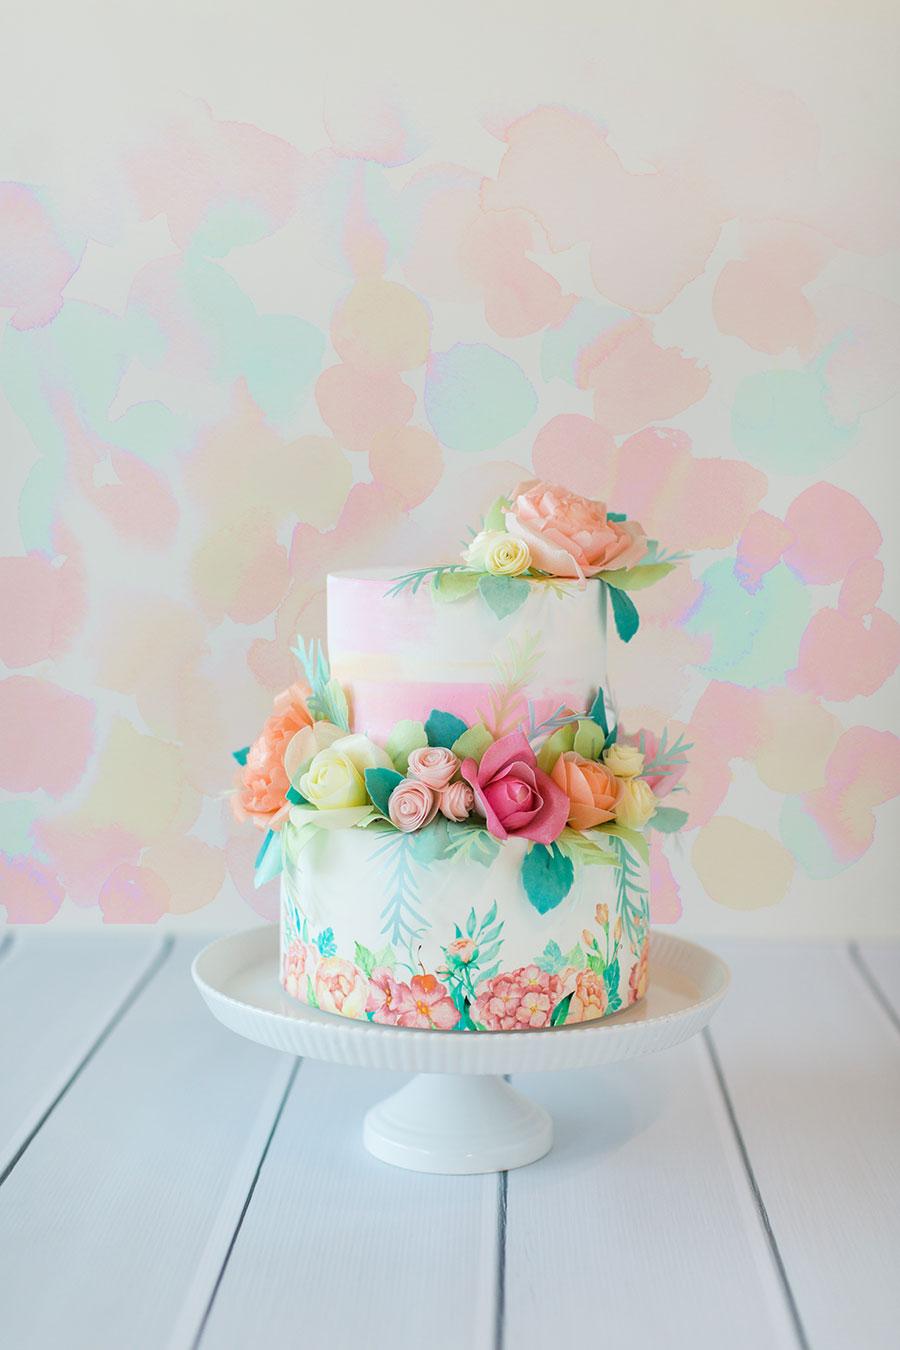 bont_fw2016issue_sweetseasonscakes_kyliecrumpphotography_004